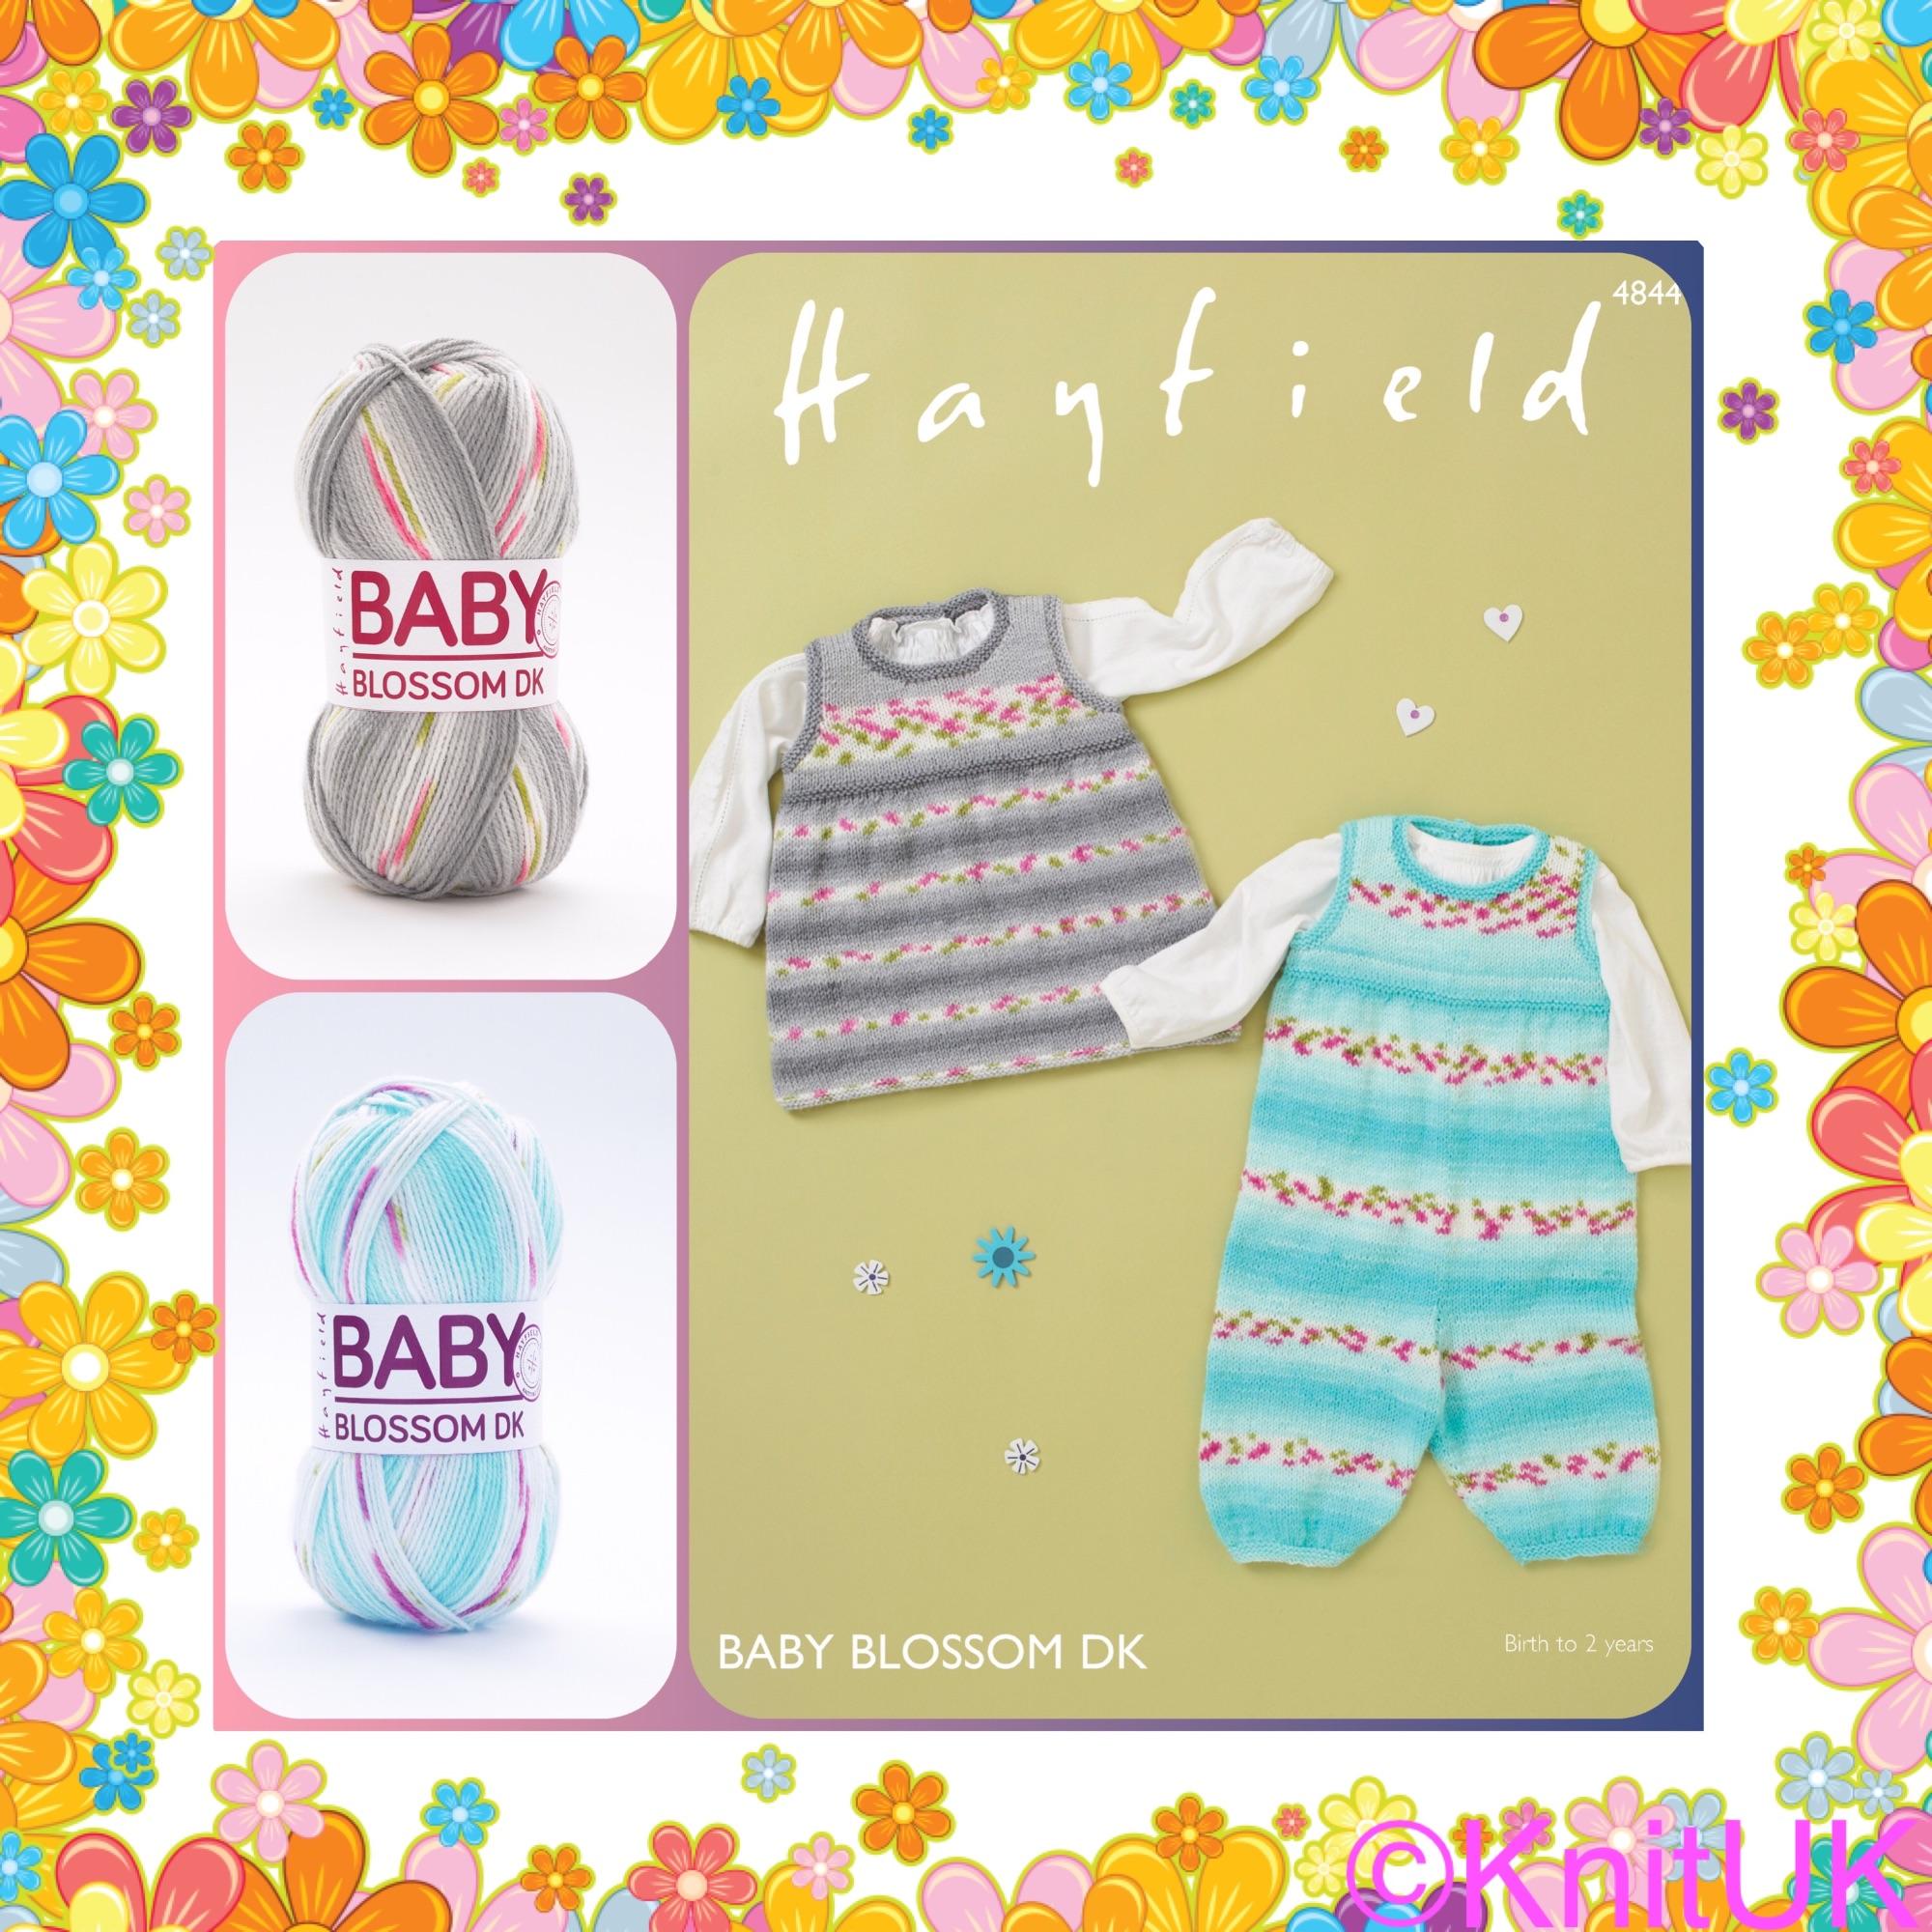 Knituk baby blossom dk knitting kit hayfield pattern and yarn balls